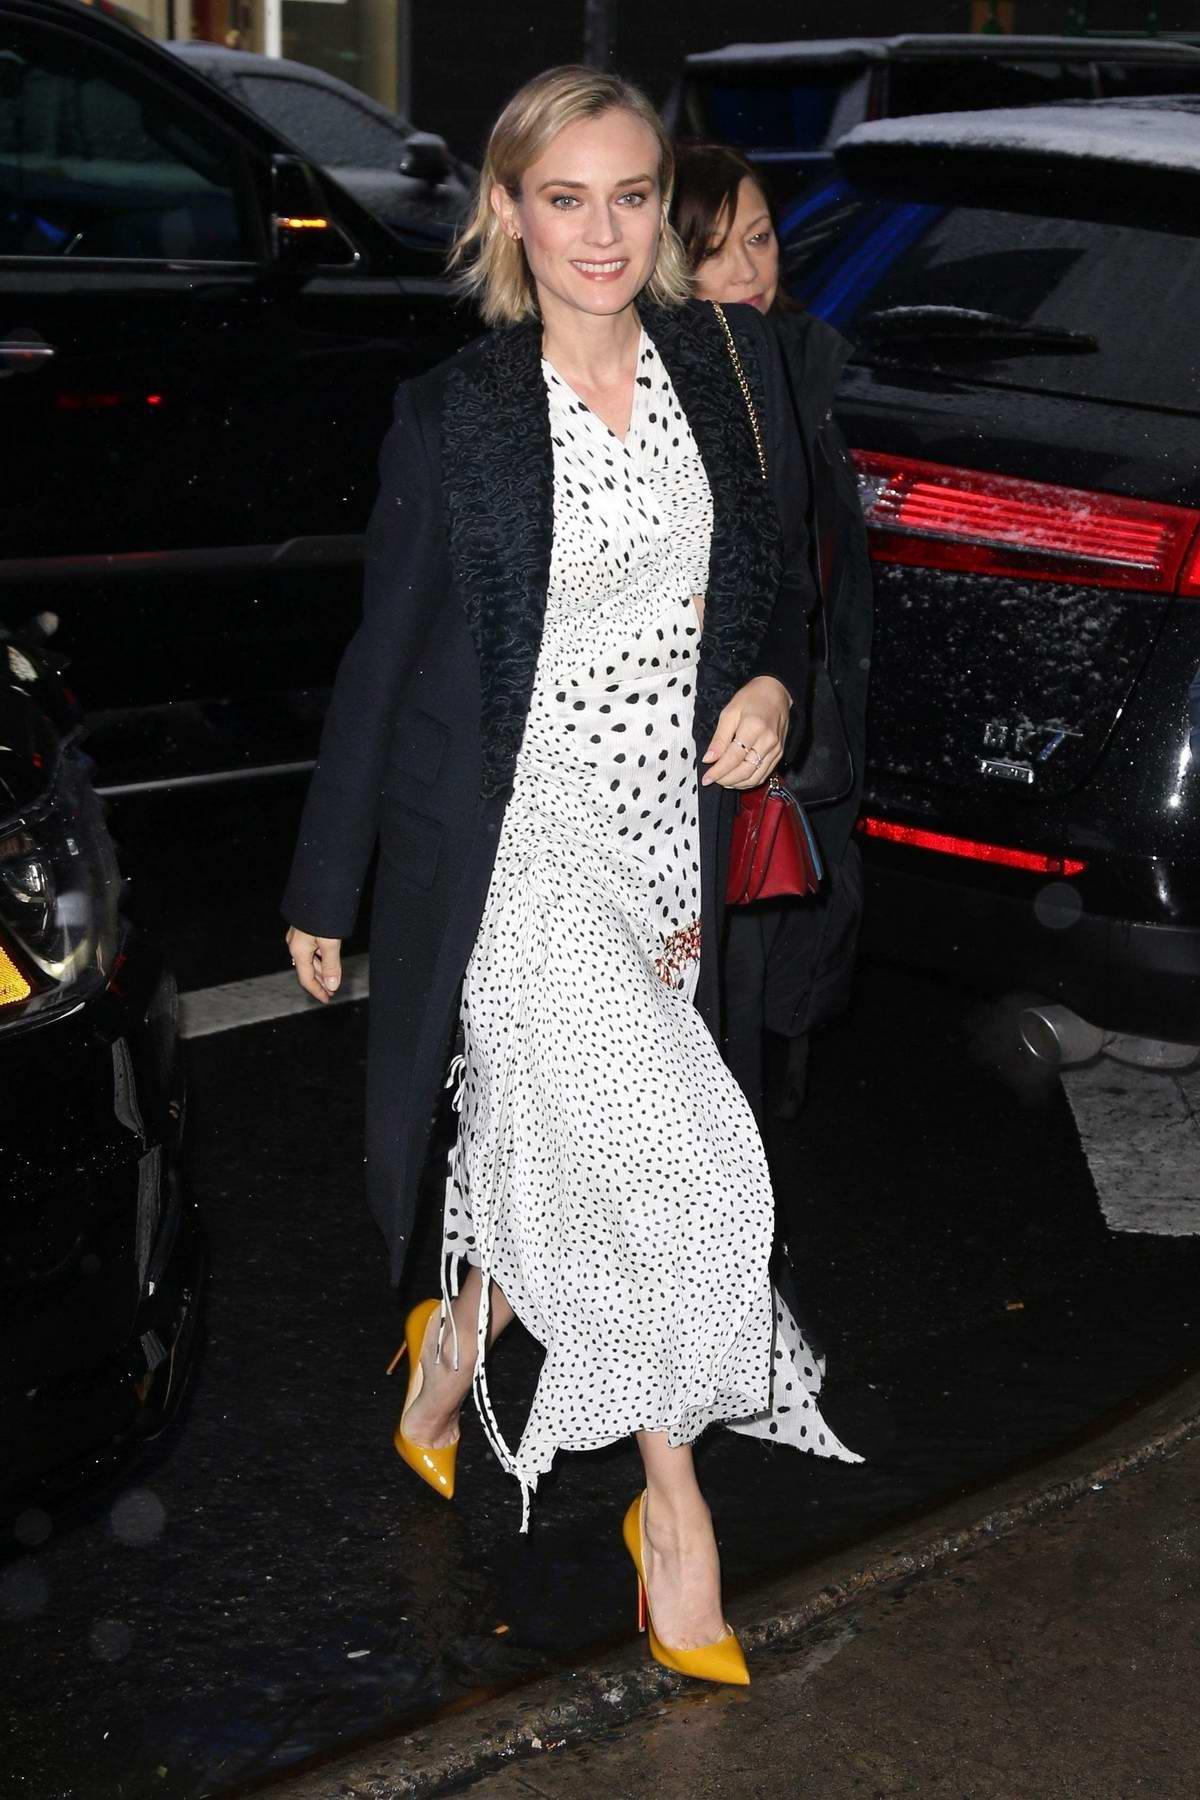 Diane Kruger arrives at 'Good Morning America' in New York City